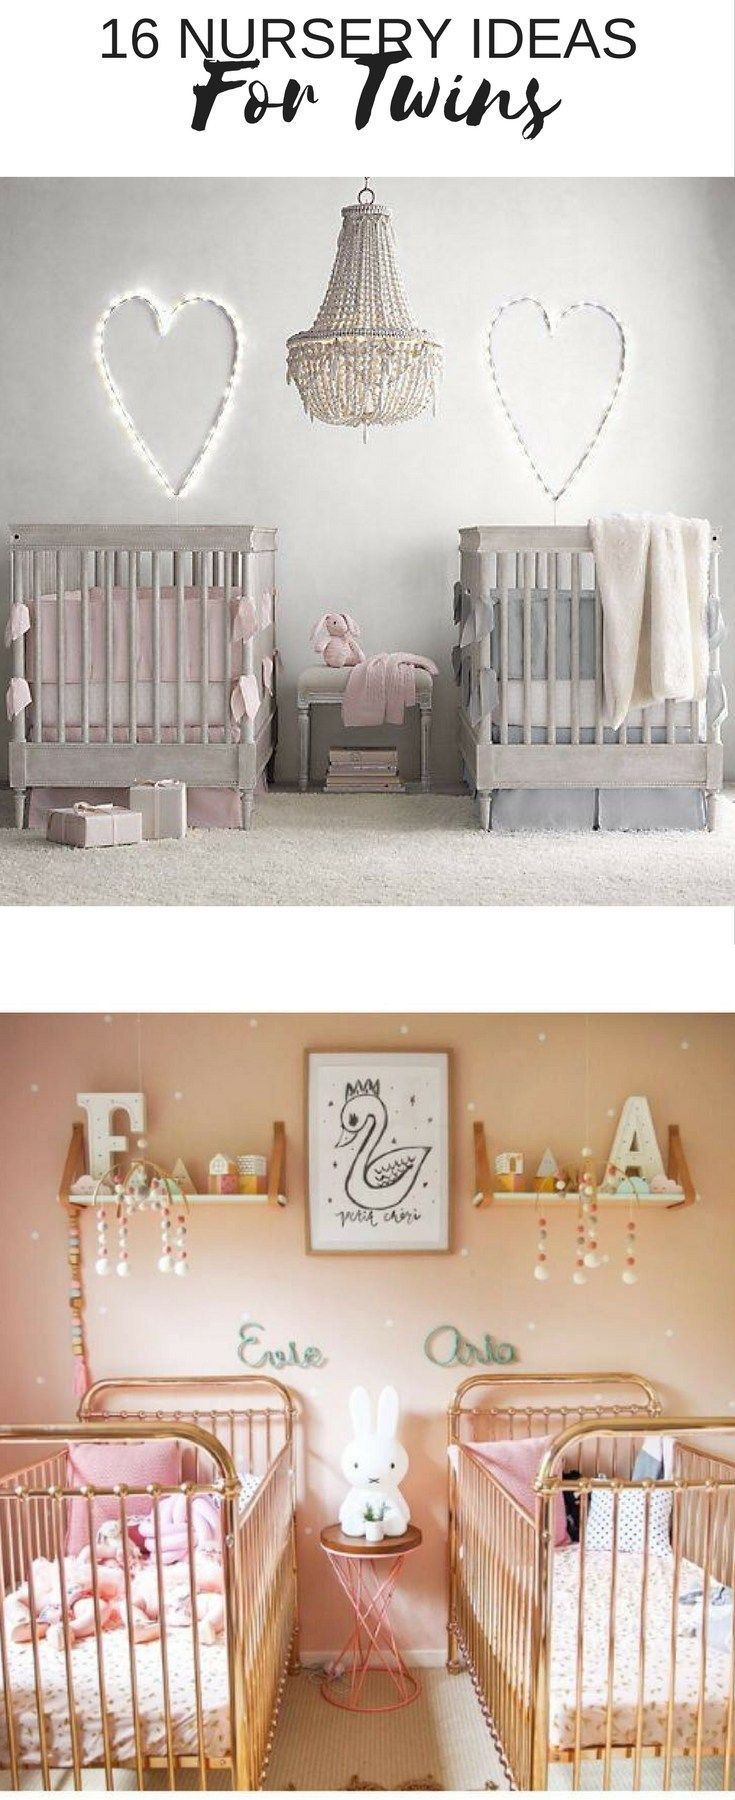 17 Gorgeous Twin Nursery Ideas | Twin nurseries, Twins and Nursery